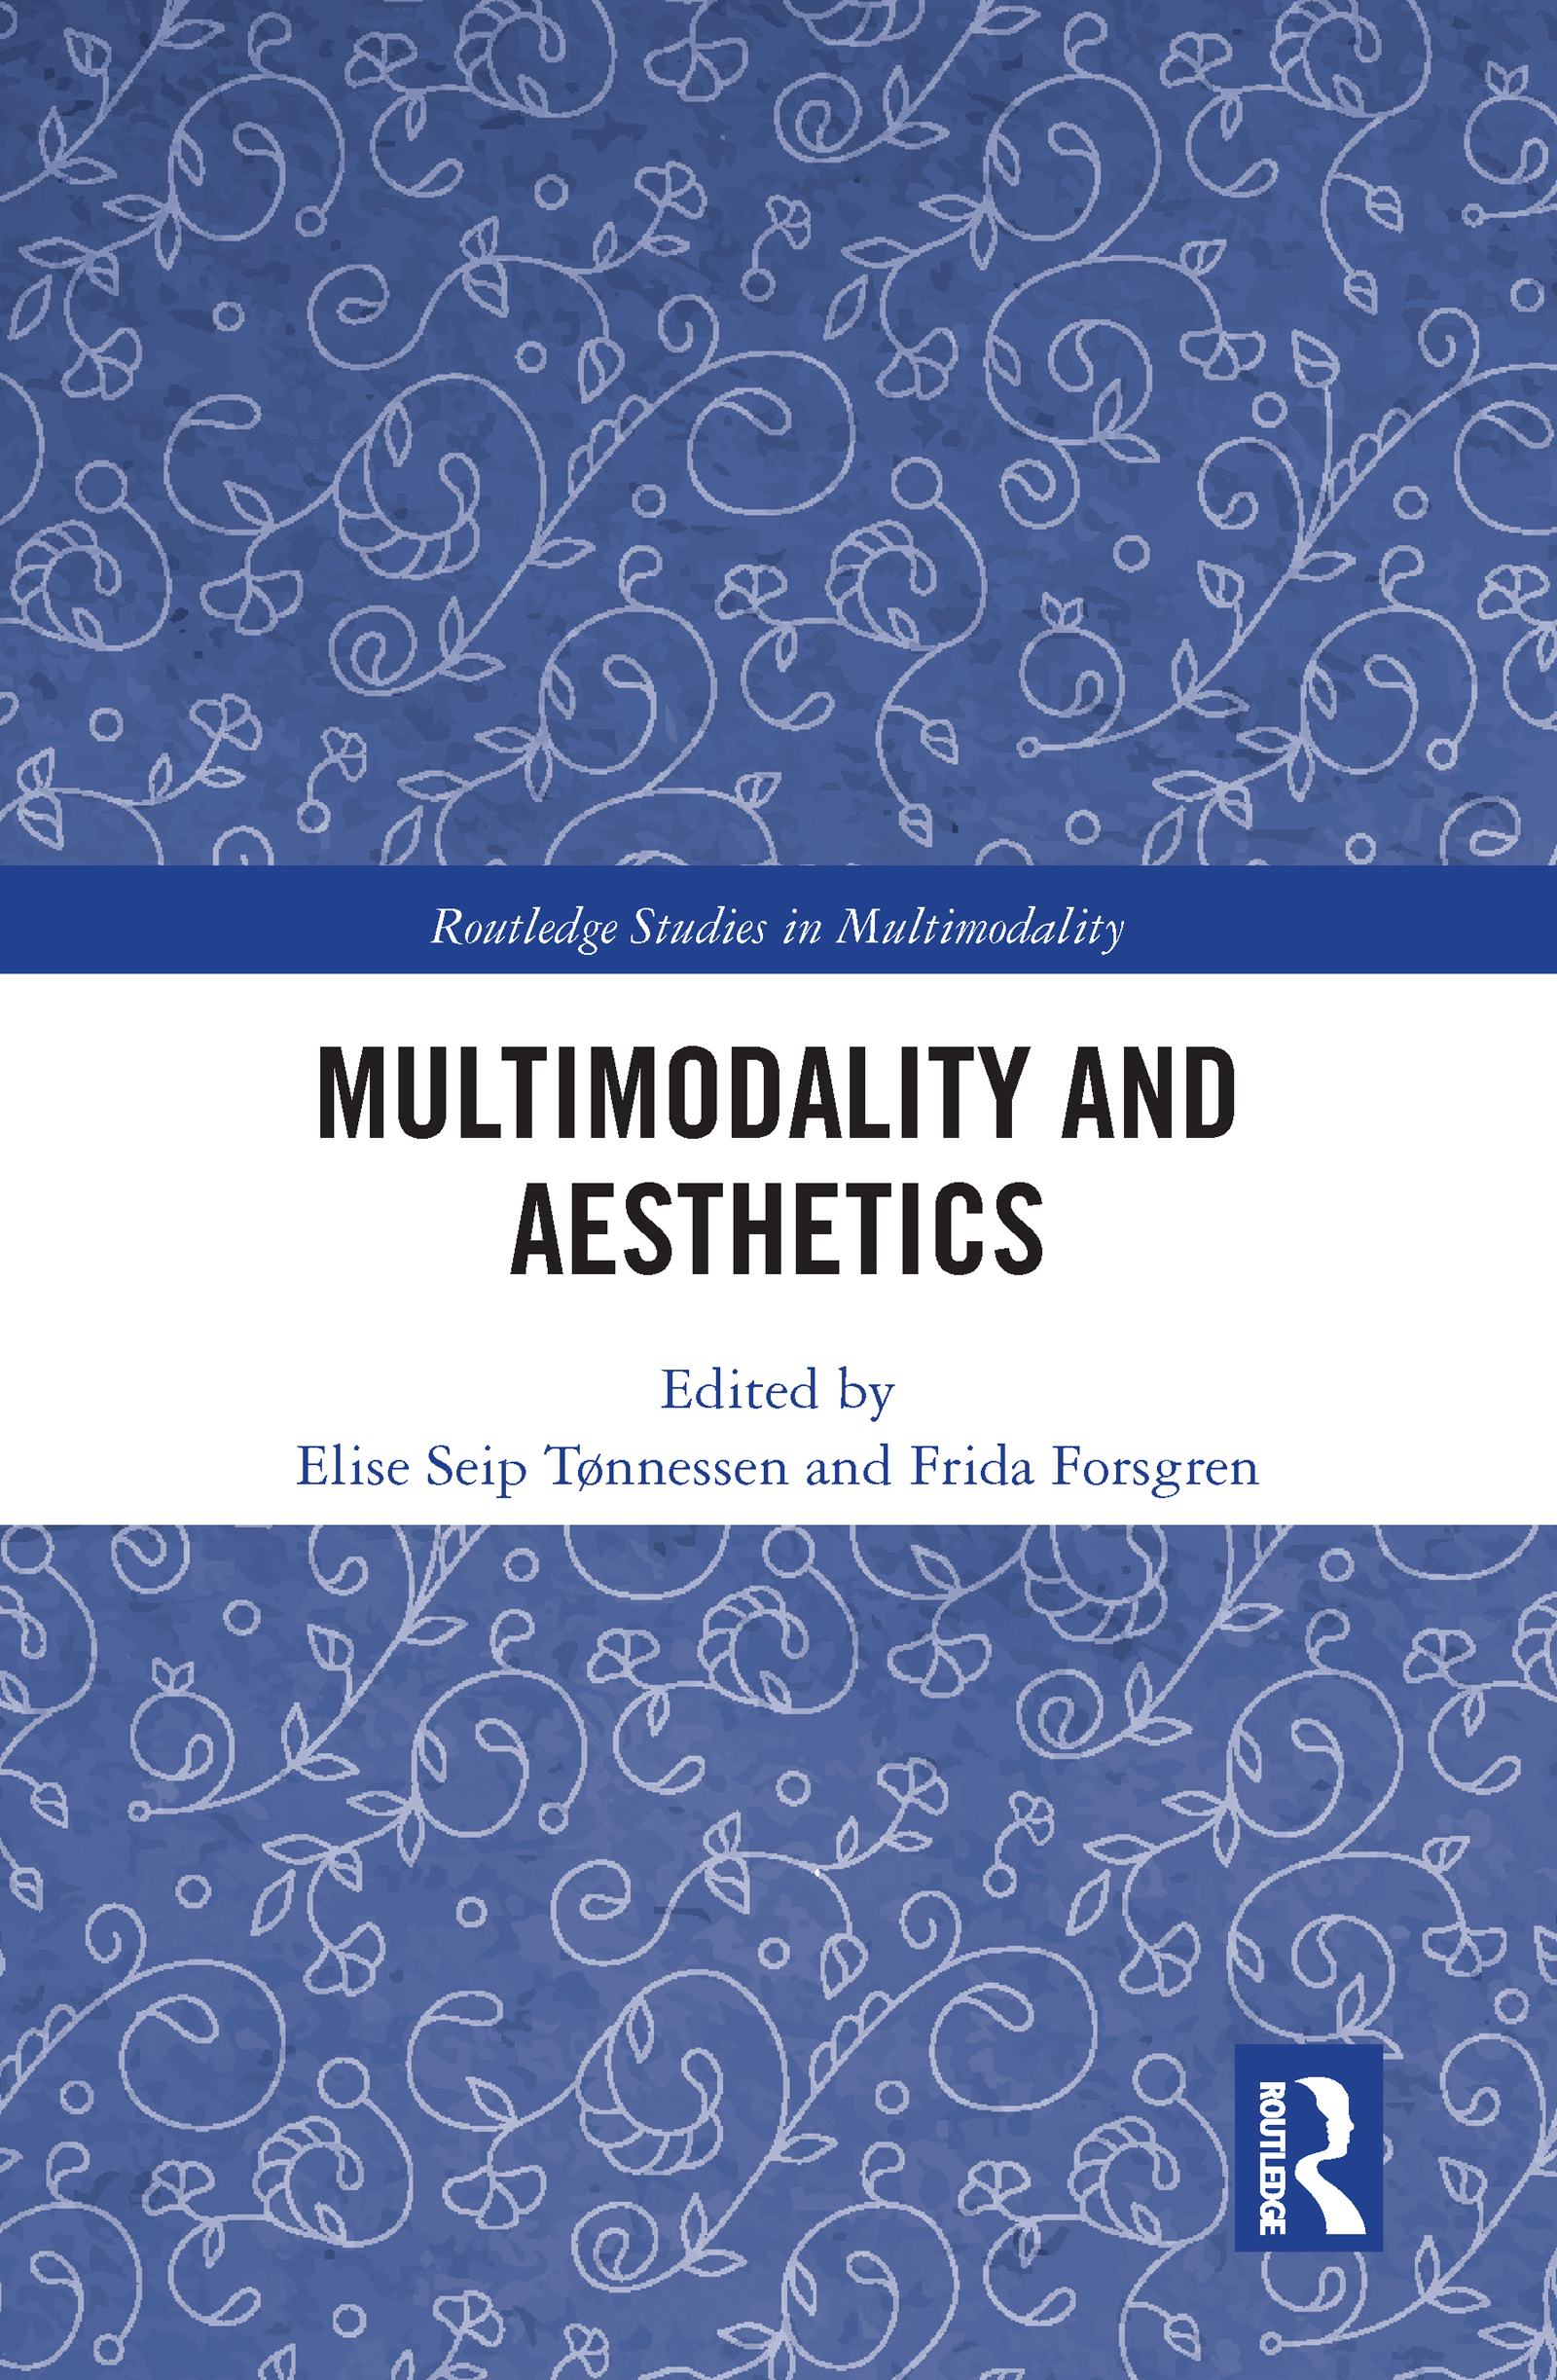 Multimodality and Aesthetics